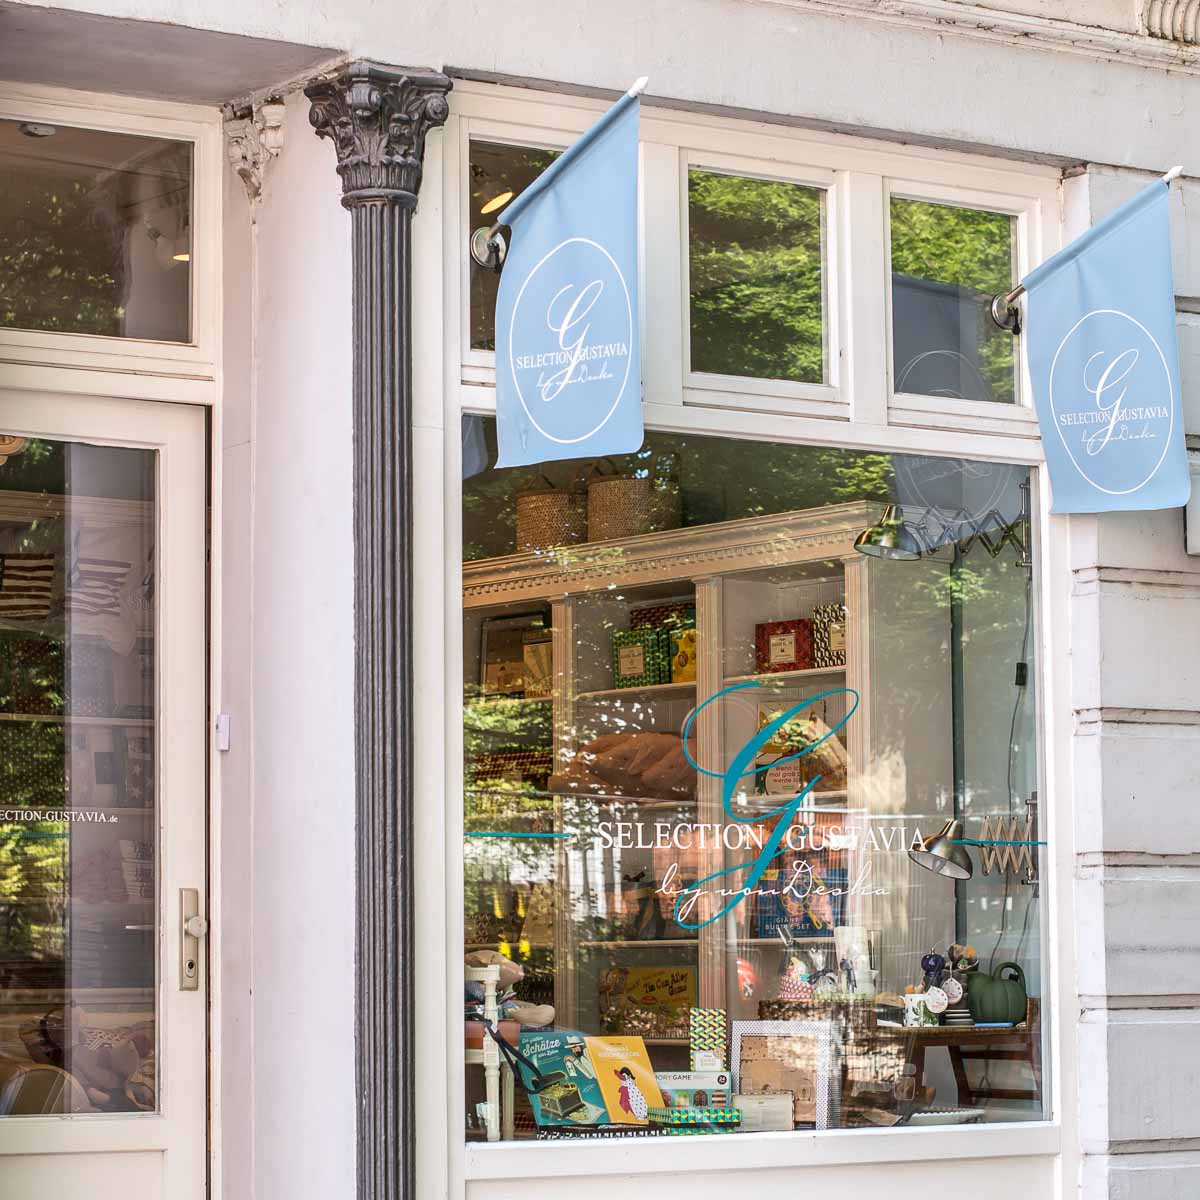 Selection Gustavia Store Hamburg-5